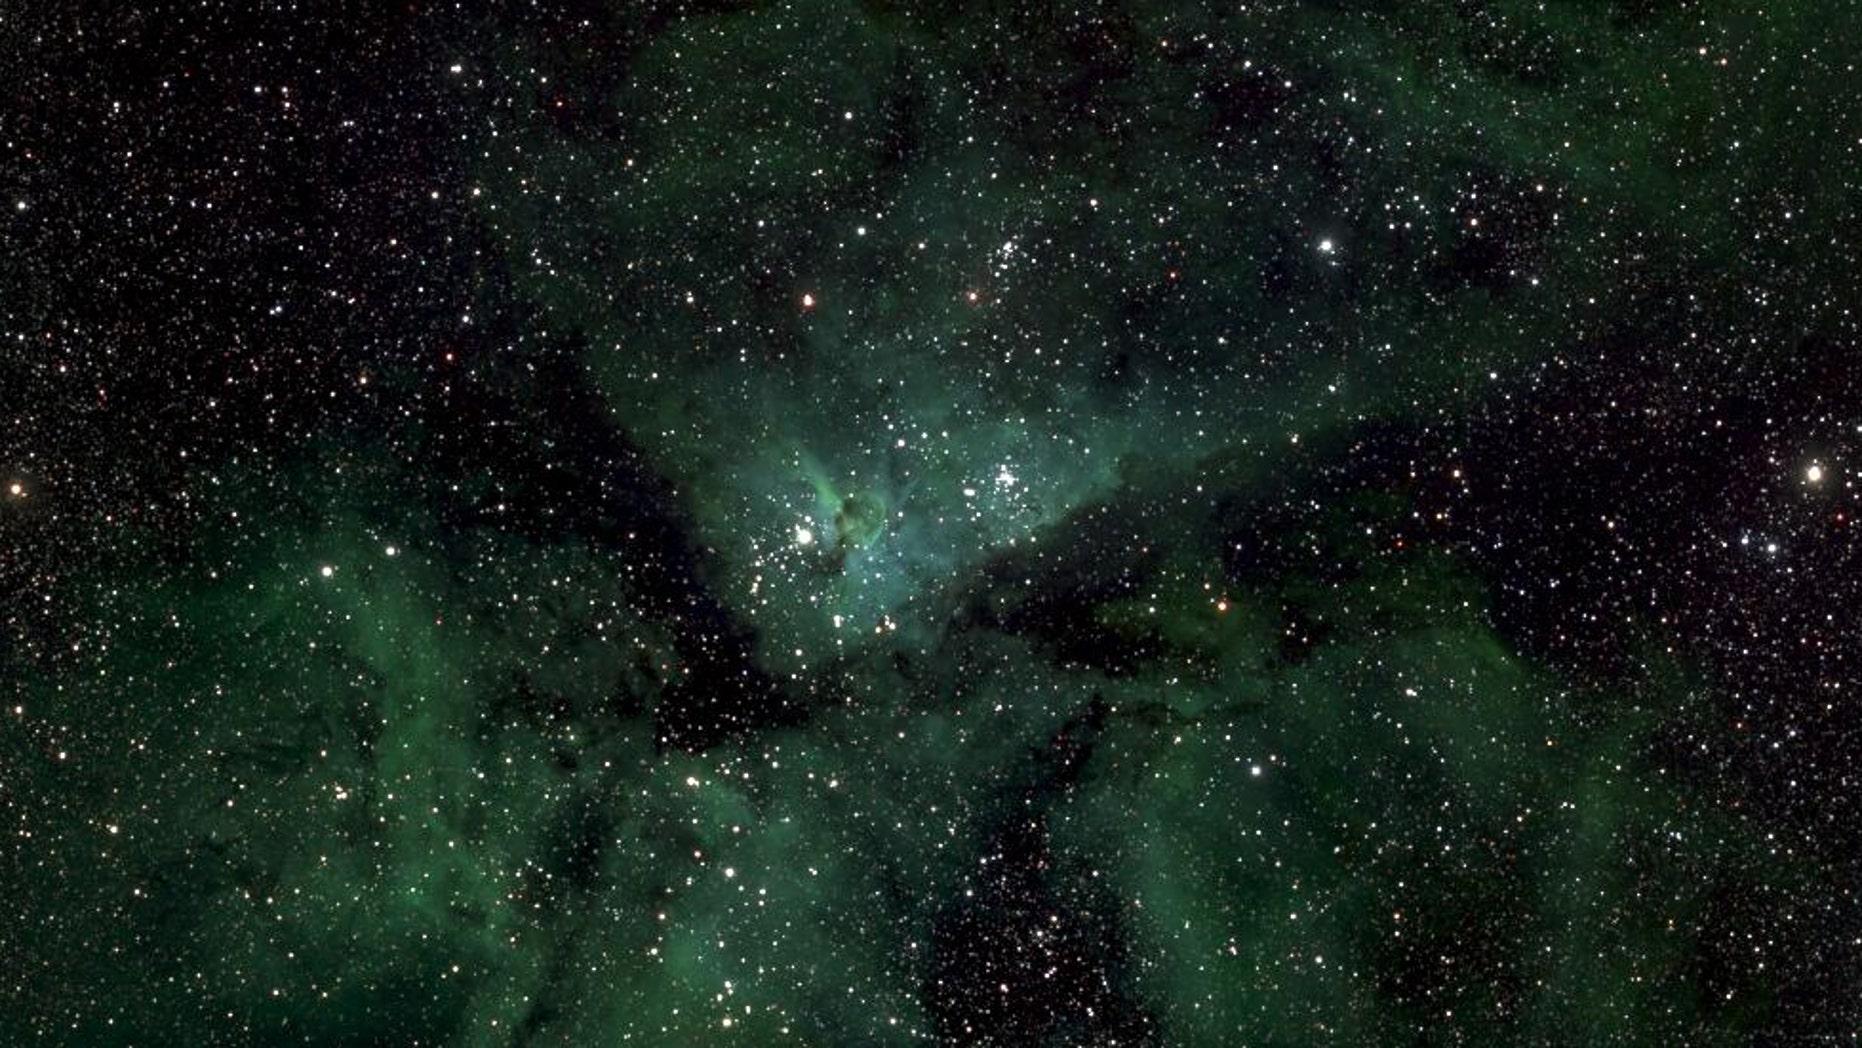 A small section of the Milky Way photo showing Eta Carinae. (Lehrstuhl für Astrophysik, RUB)